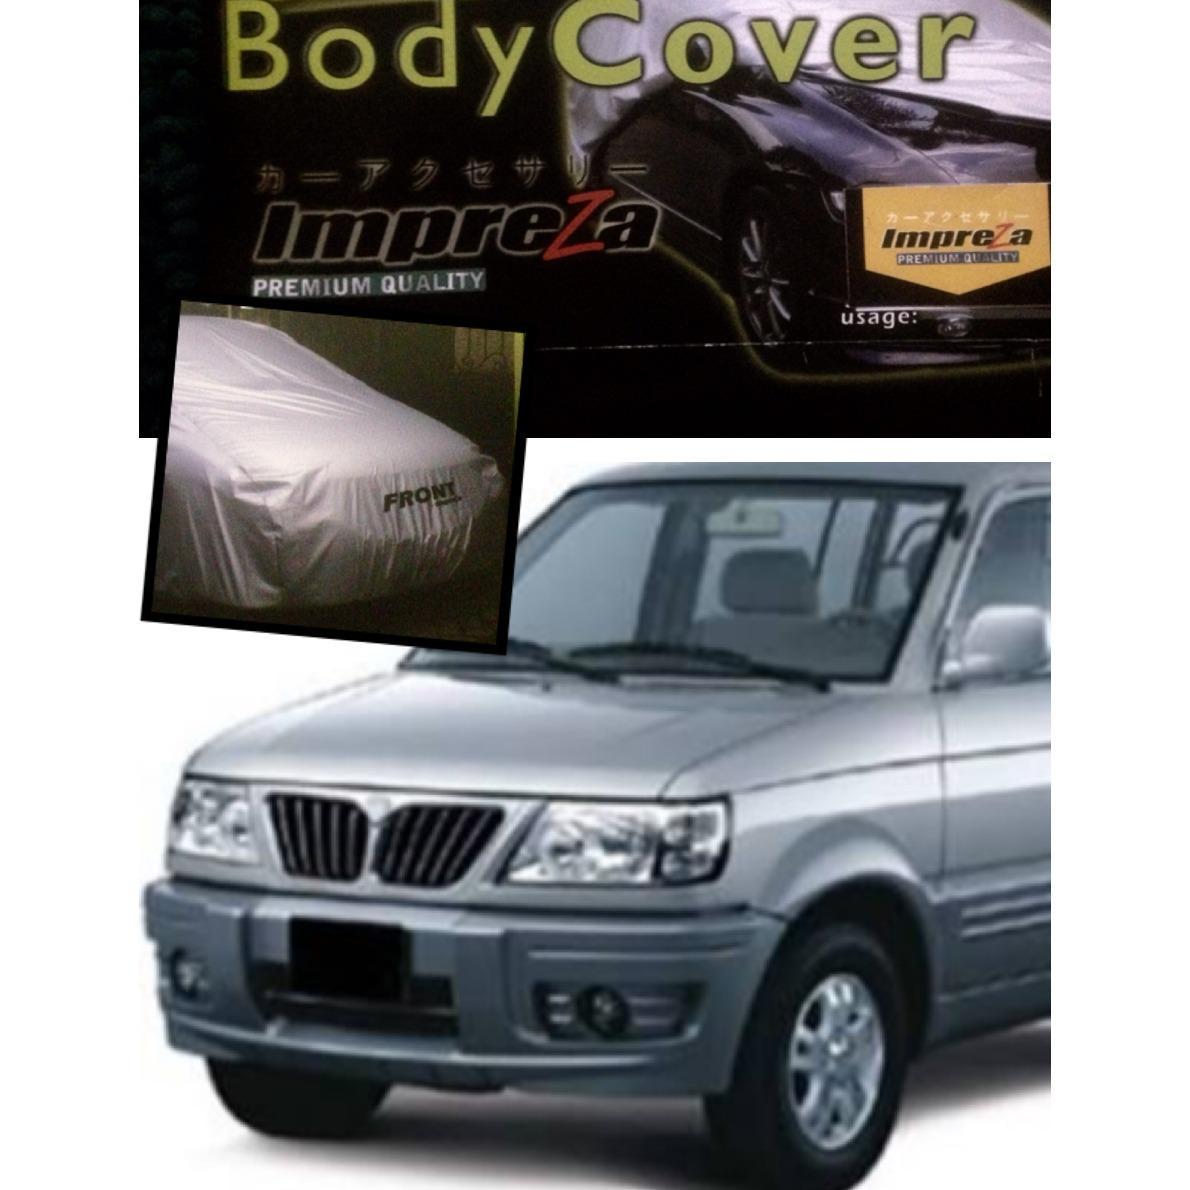 Diskon Impreza Body Cover Mobil Mitsubishi Kuda Grey Selimut Mobil Pelindung Mobil Impreza